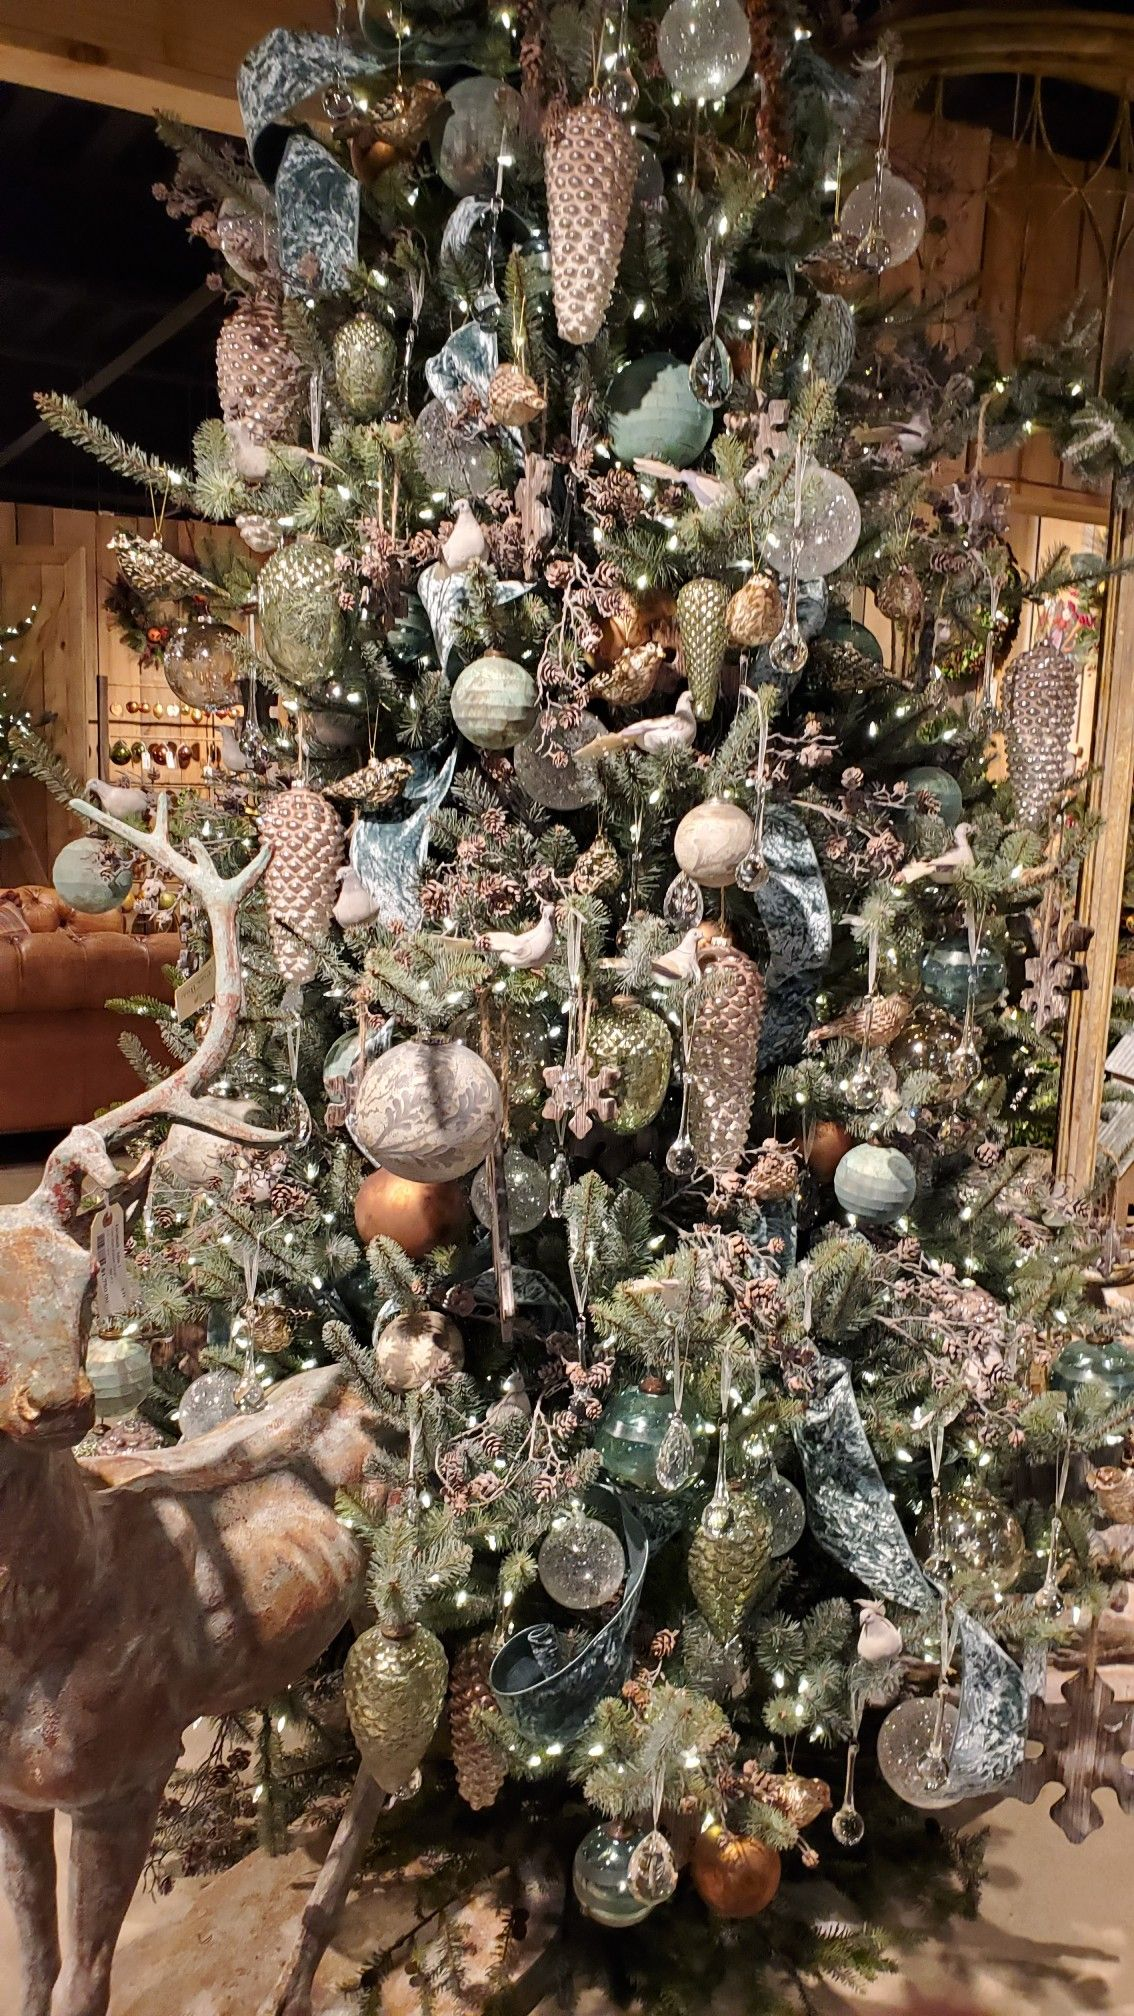 Pin by Kara Mallouk on Christmas Concepts in 2020   Christmas tree design, Holiday decor ...